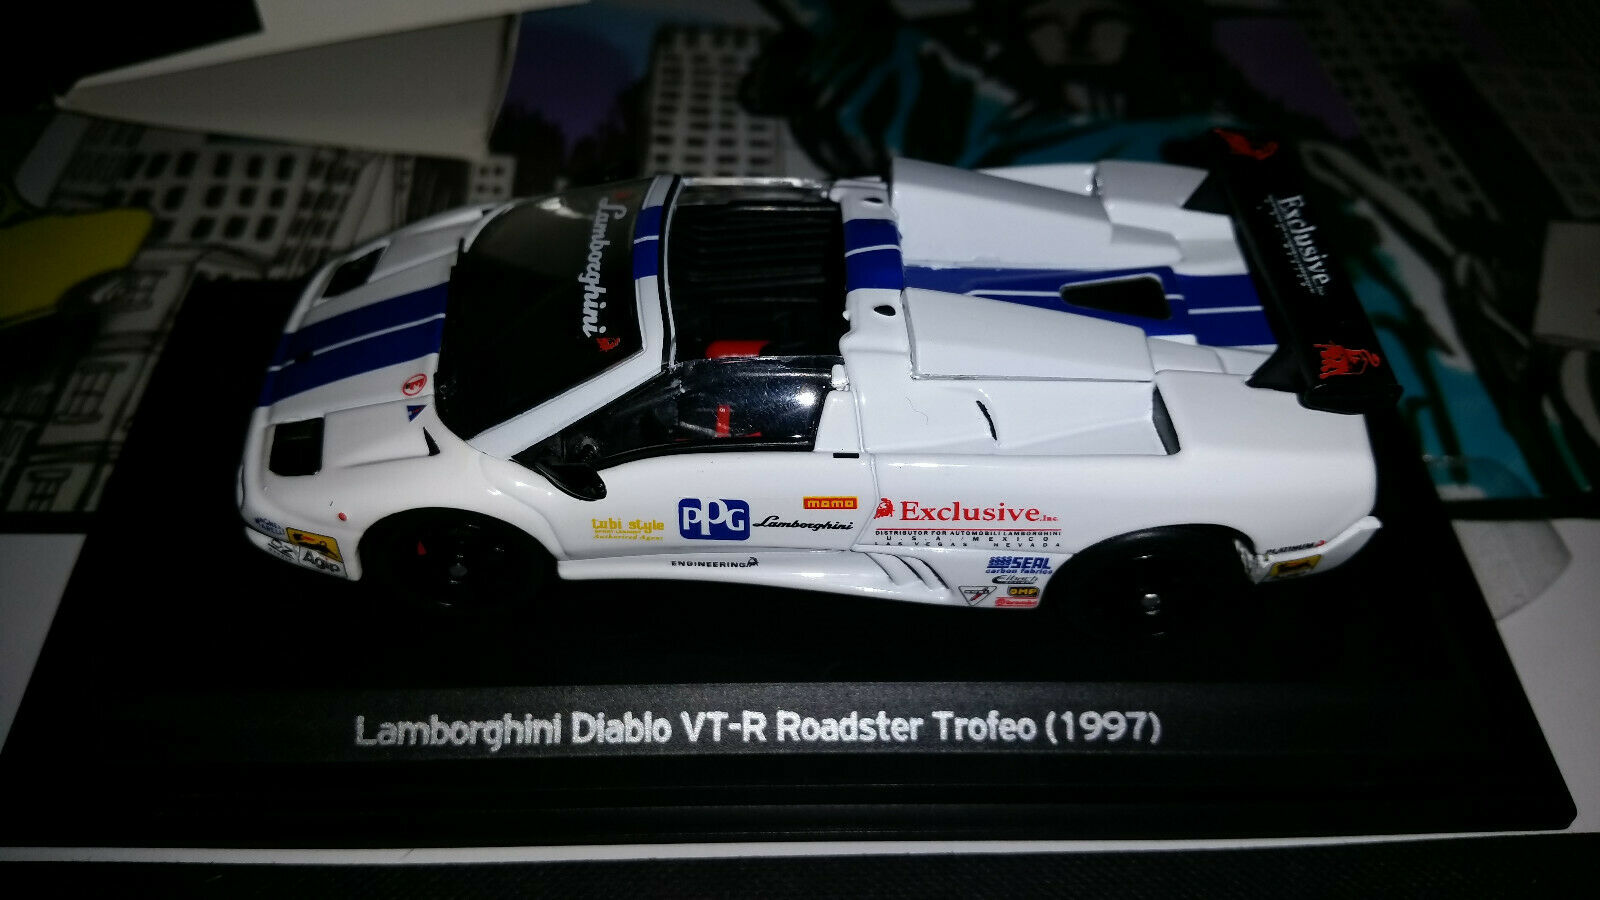 WHITEBOX LAMBORGHINI DIABLO VT-R Roadster Trofeo ( 1997)